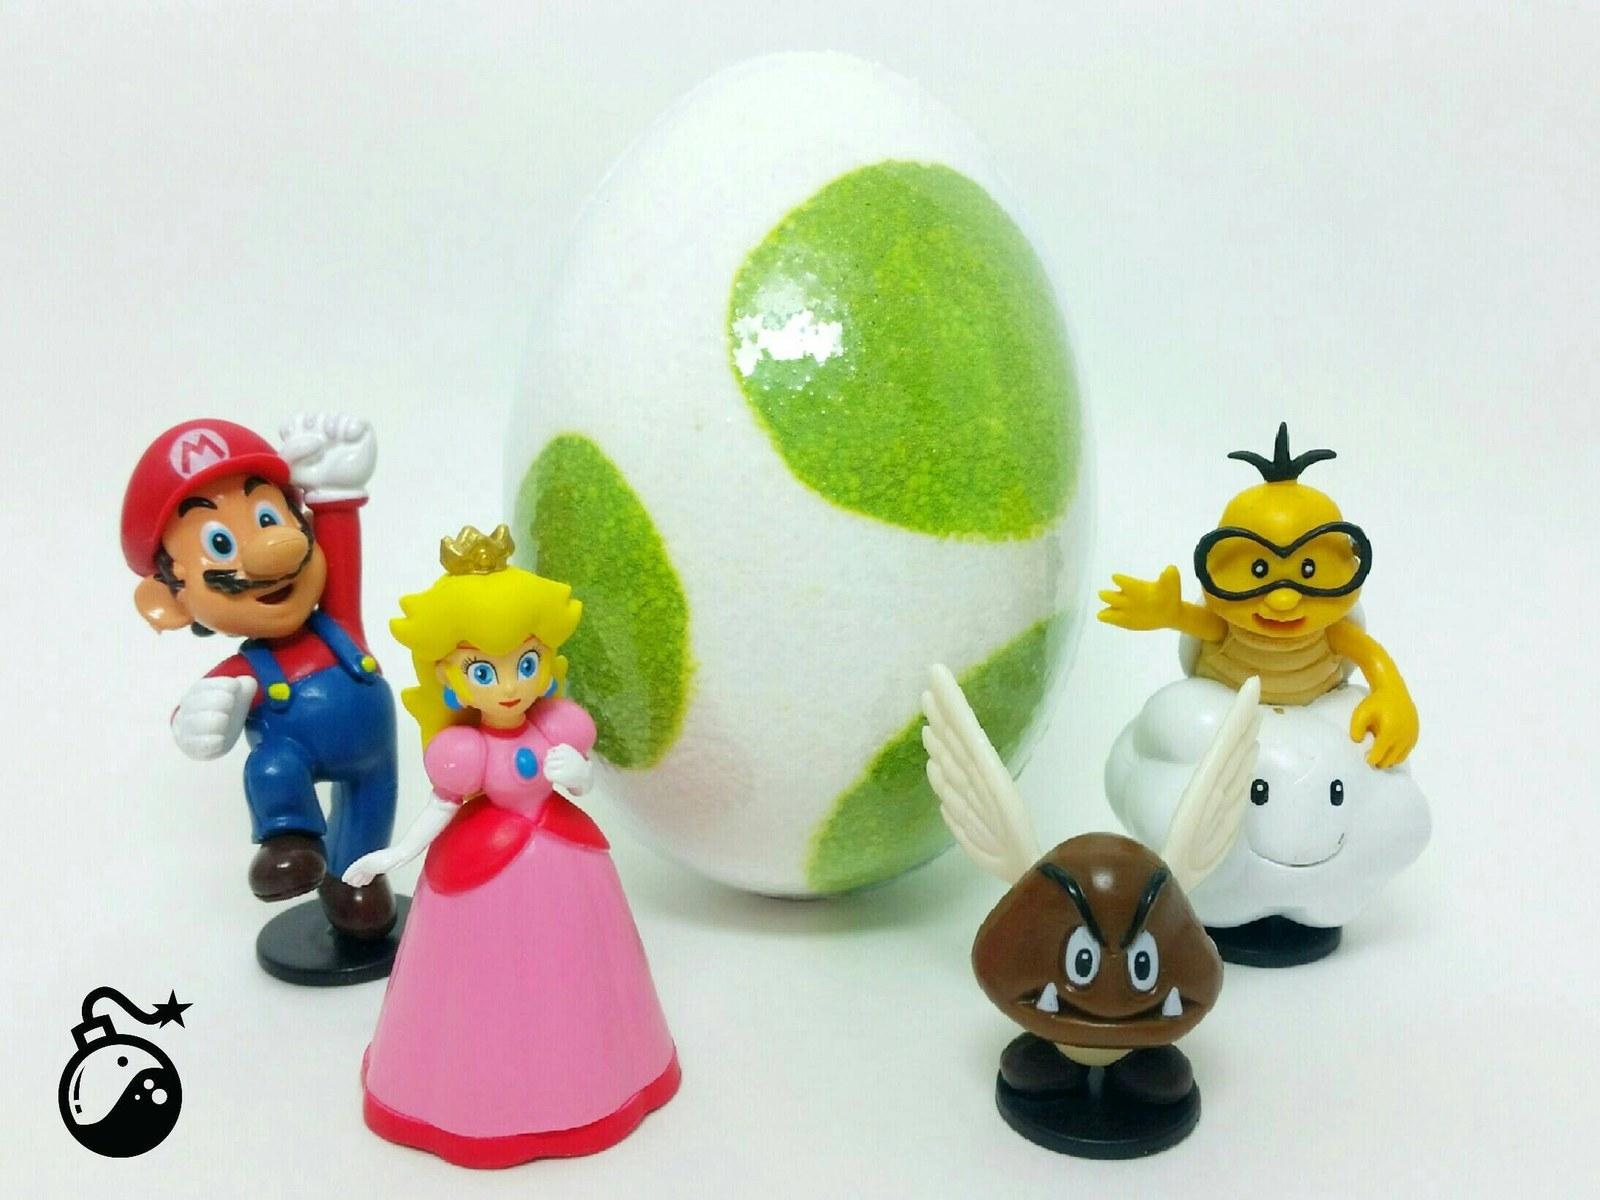 various nintendo character figures in front of yoshi egg bath bomb